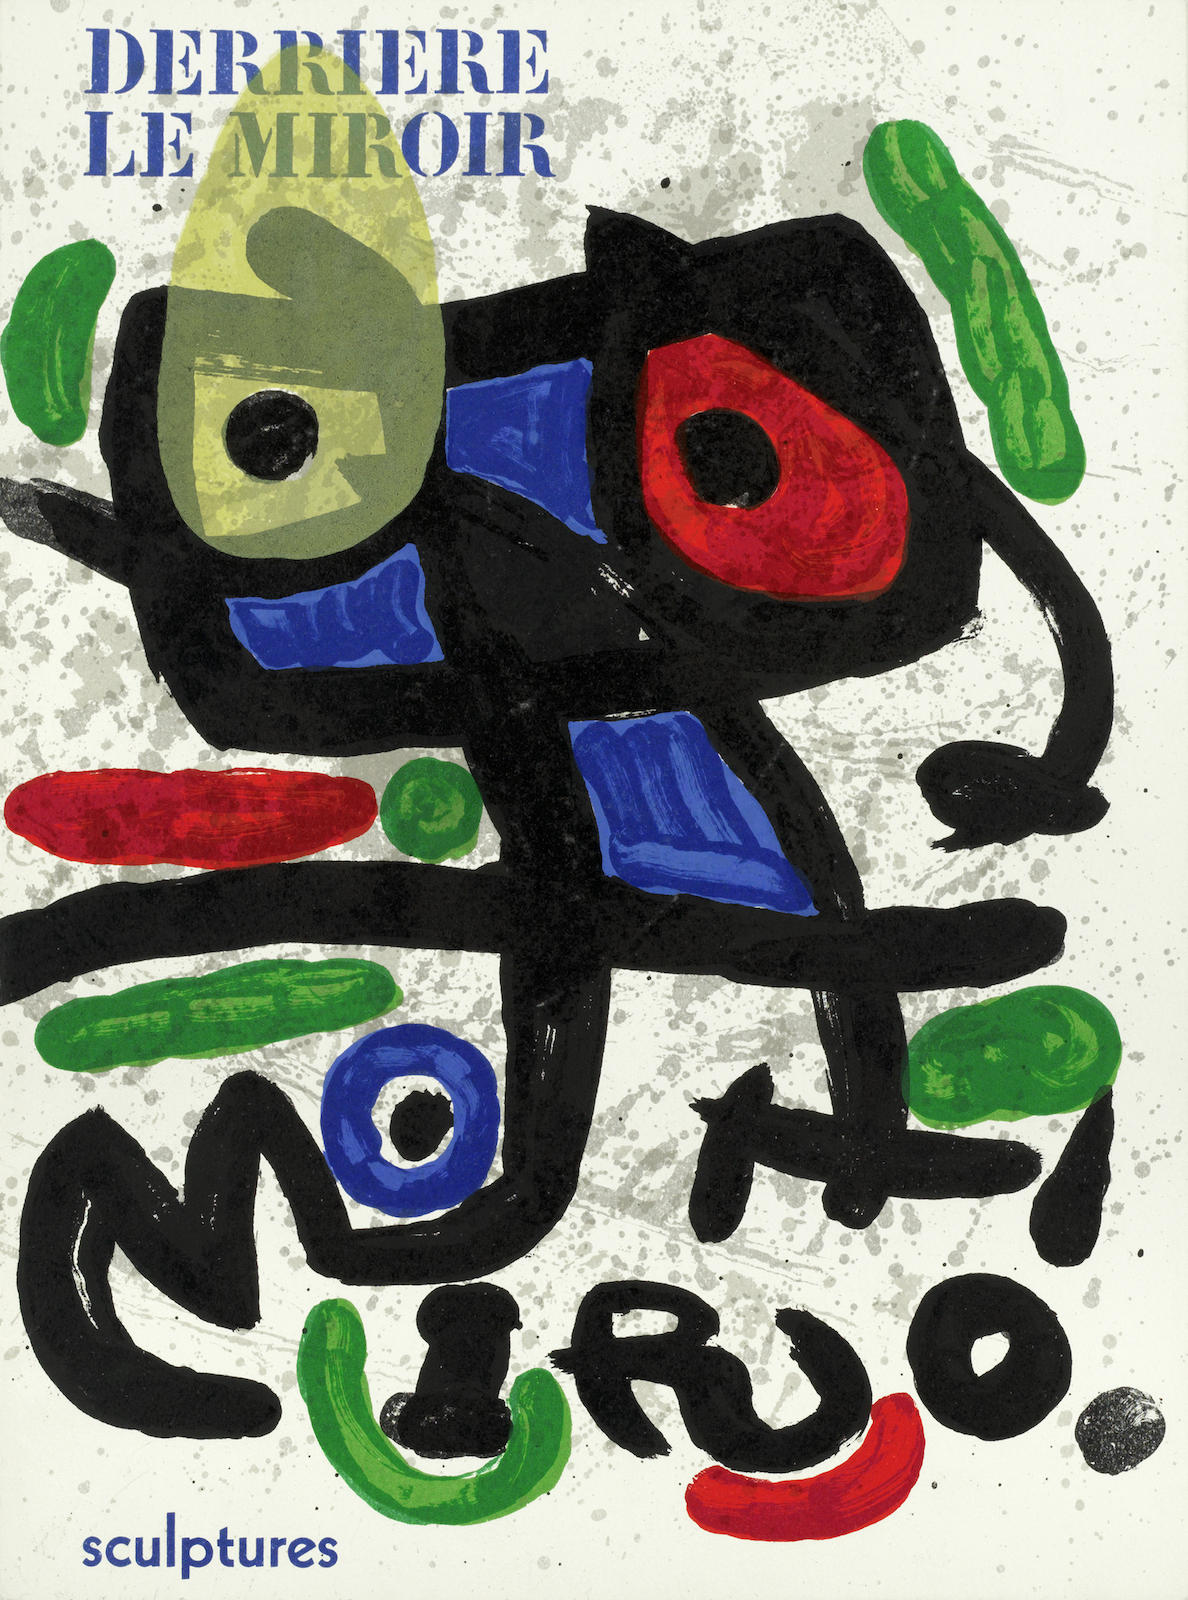 Joan Miro-Derriere Le Miroir No. 29-30, 117, 164-165, 169, 186, 193-194, 203 & 231; L'Ete, from 'Verve Vol. 1, No.3' (Dupin 1310)-1978